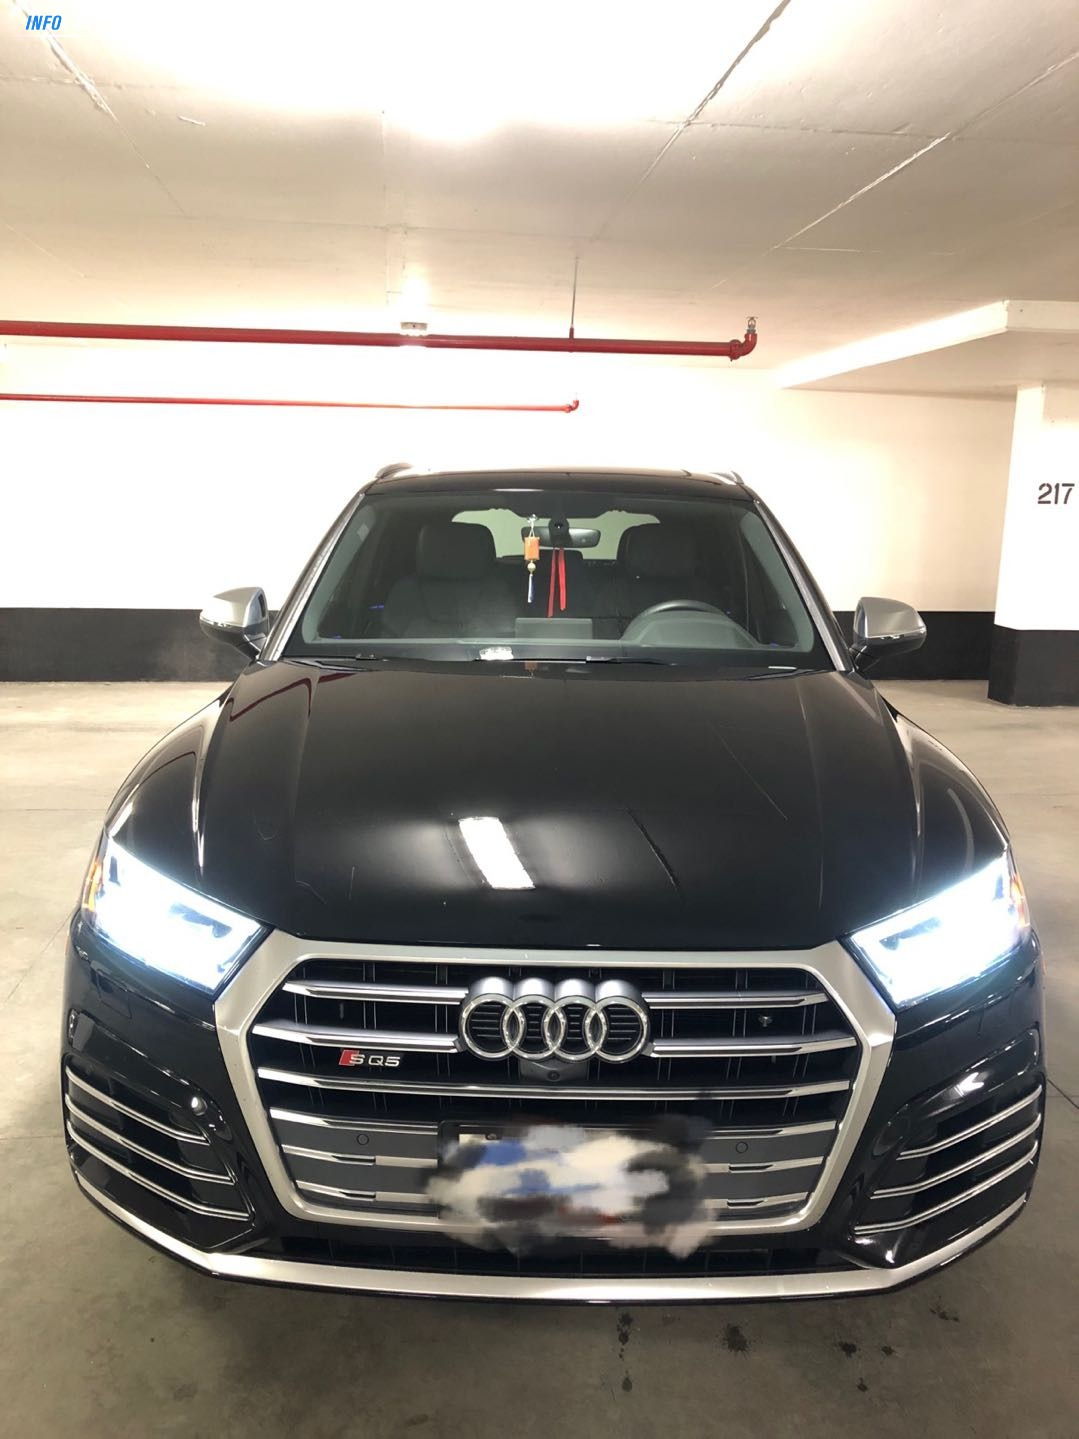 2019 Audi SQ5 technik quattro - INFOCAR - Toronto's Most Comprehensive New and Used Auto Trading Platform